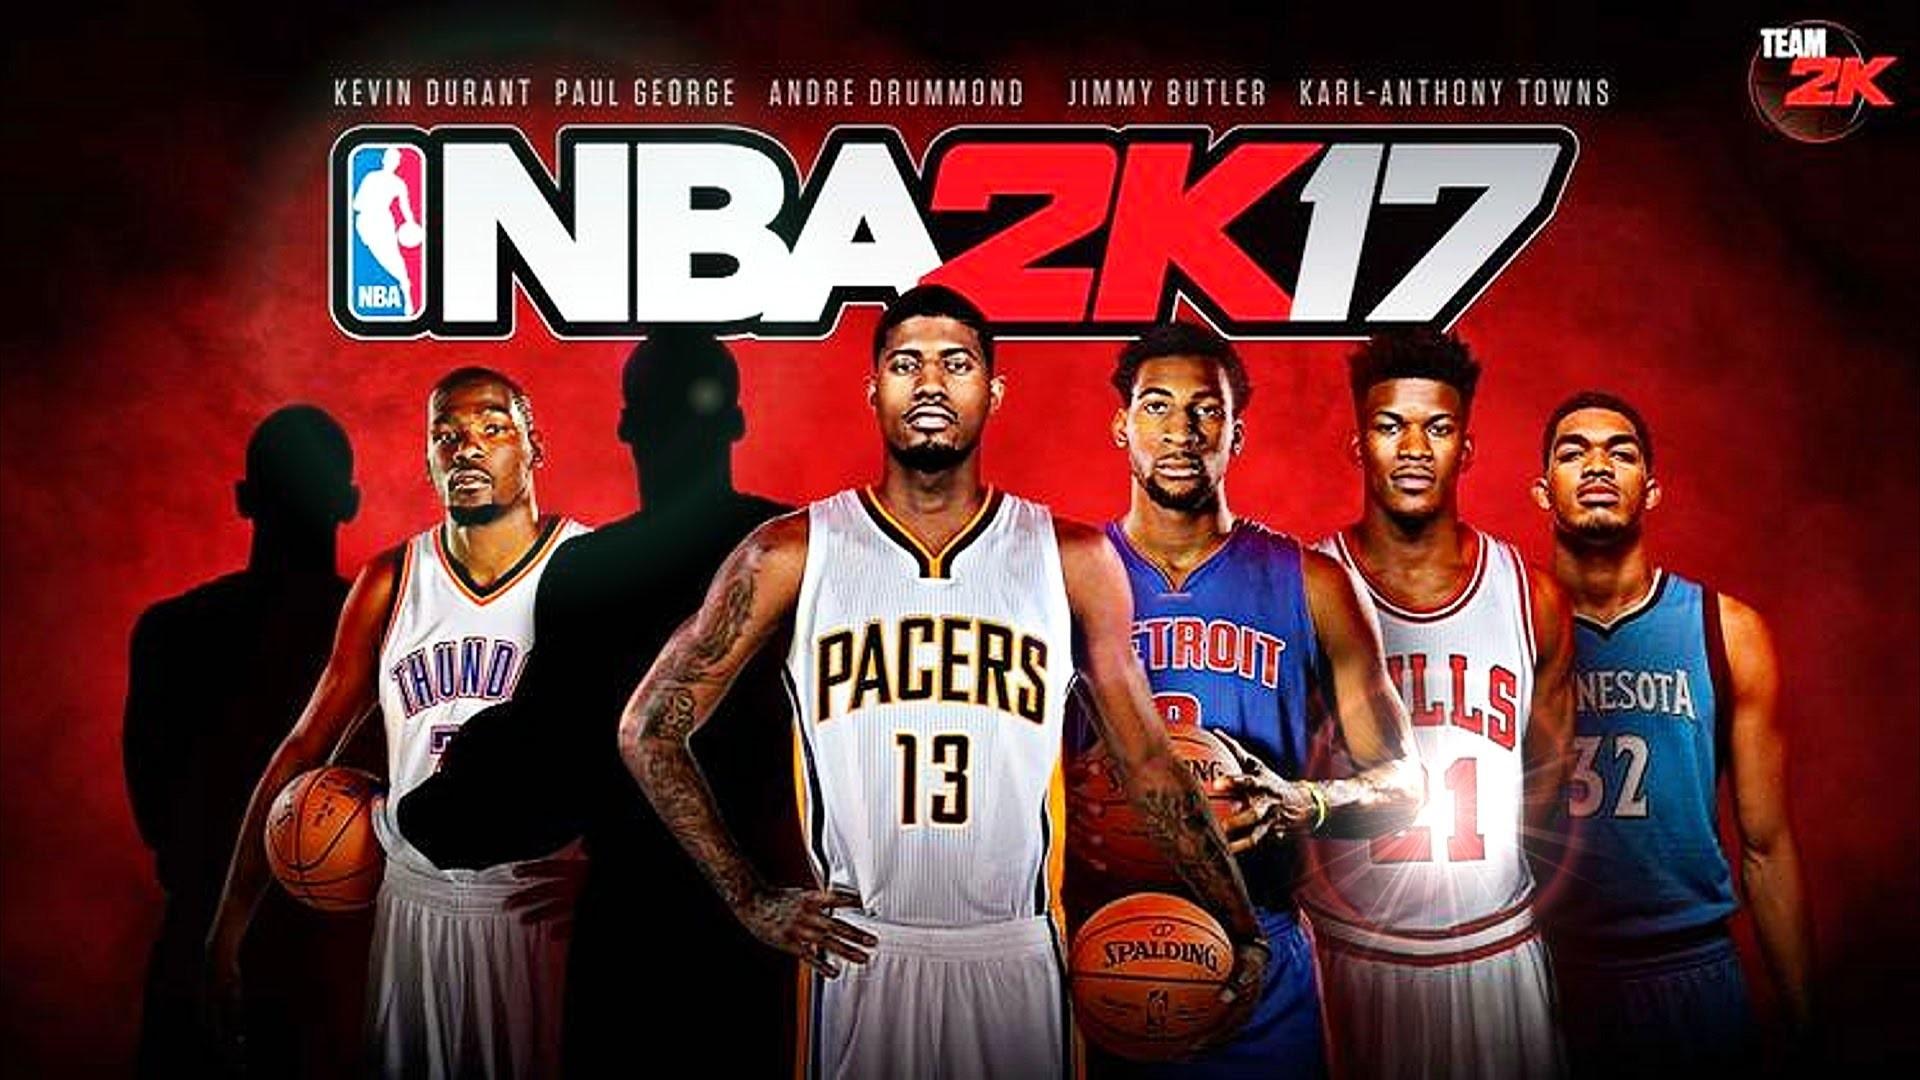 King Basketball Wallpaper Paul George | Basketball | Pinterest .